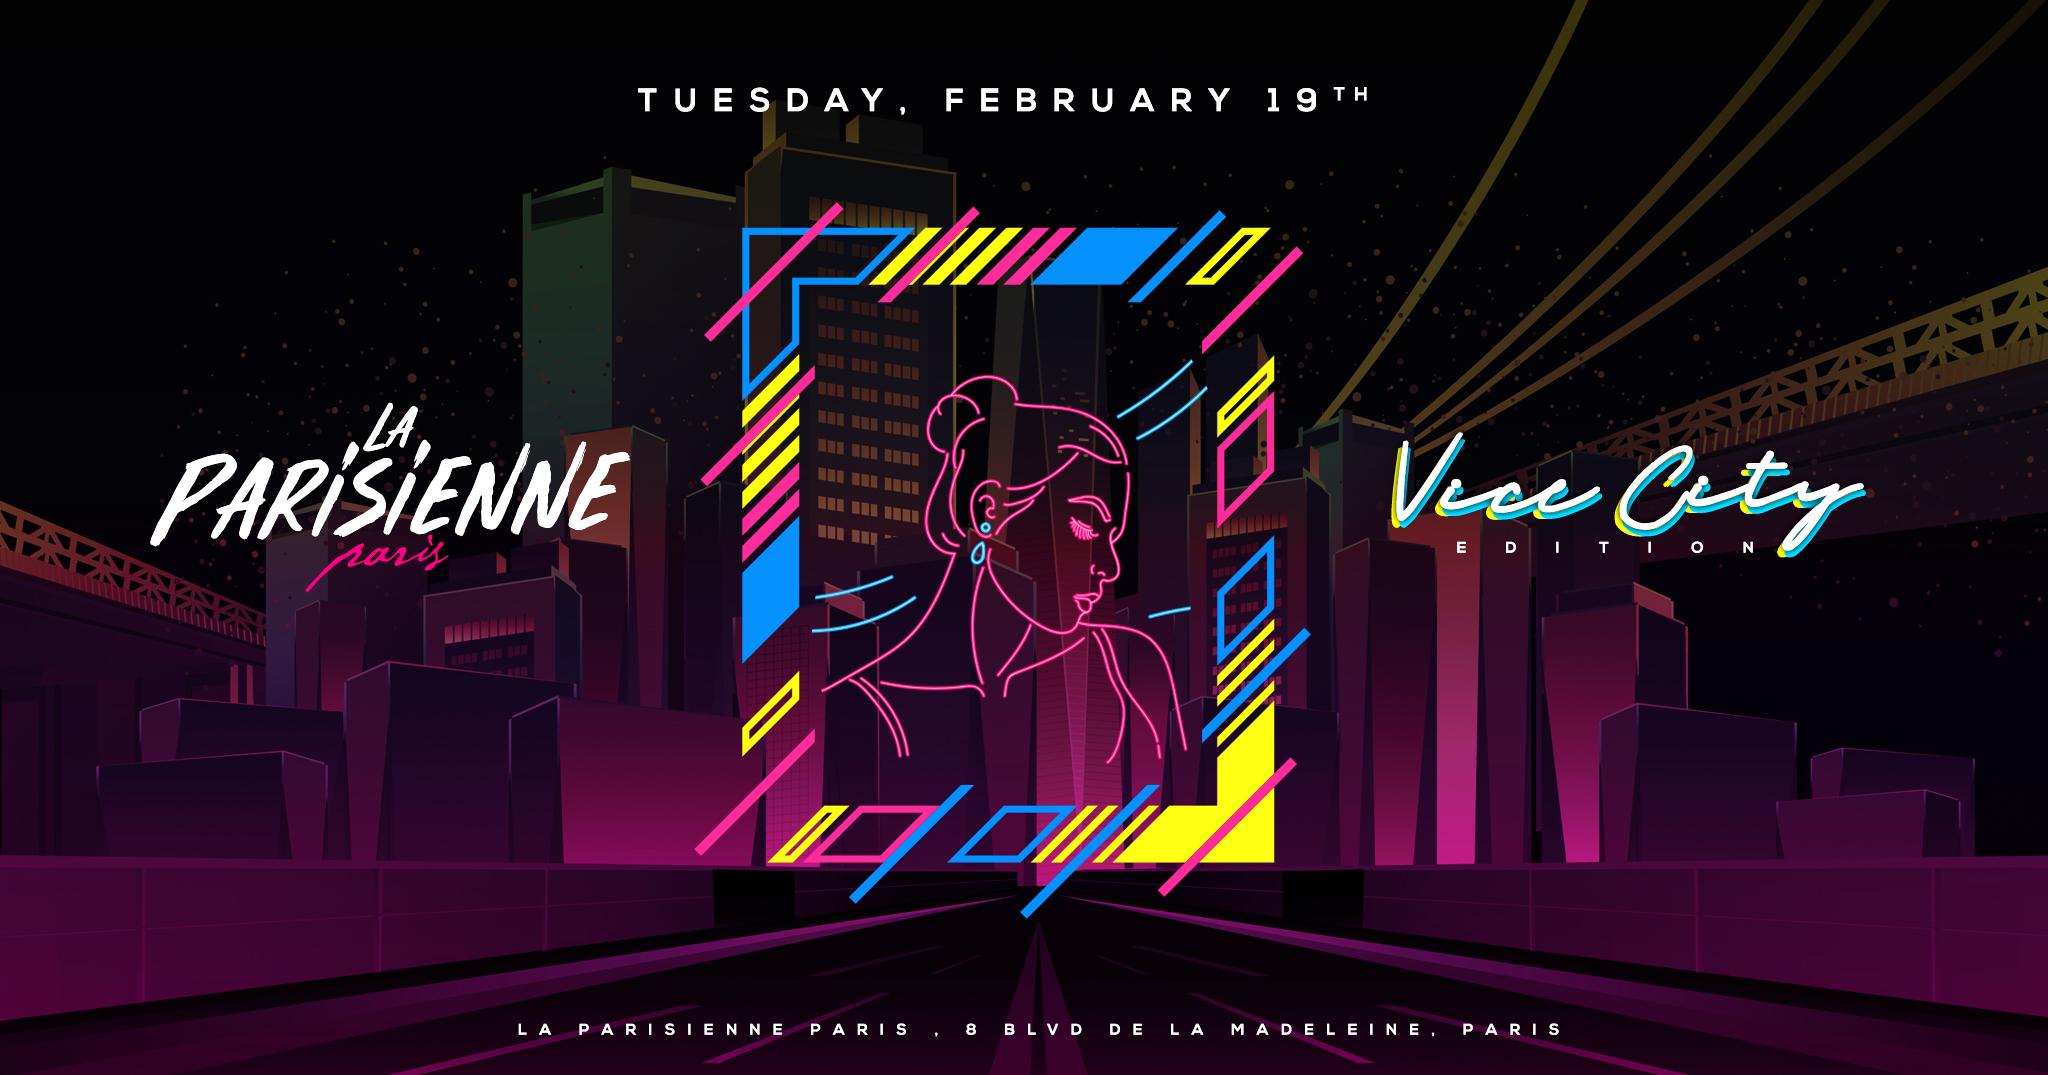 La Parisienne X Vice City Edition X Tuesday 19th Feb